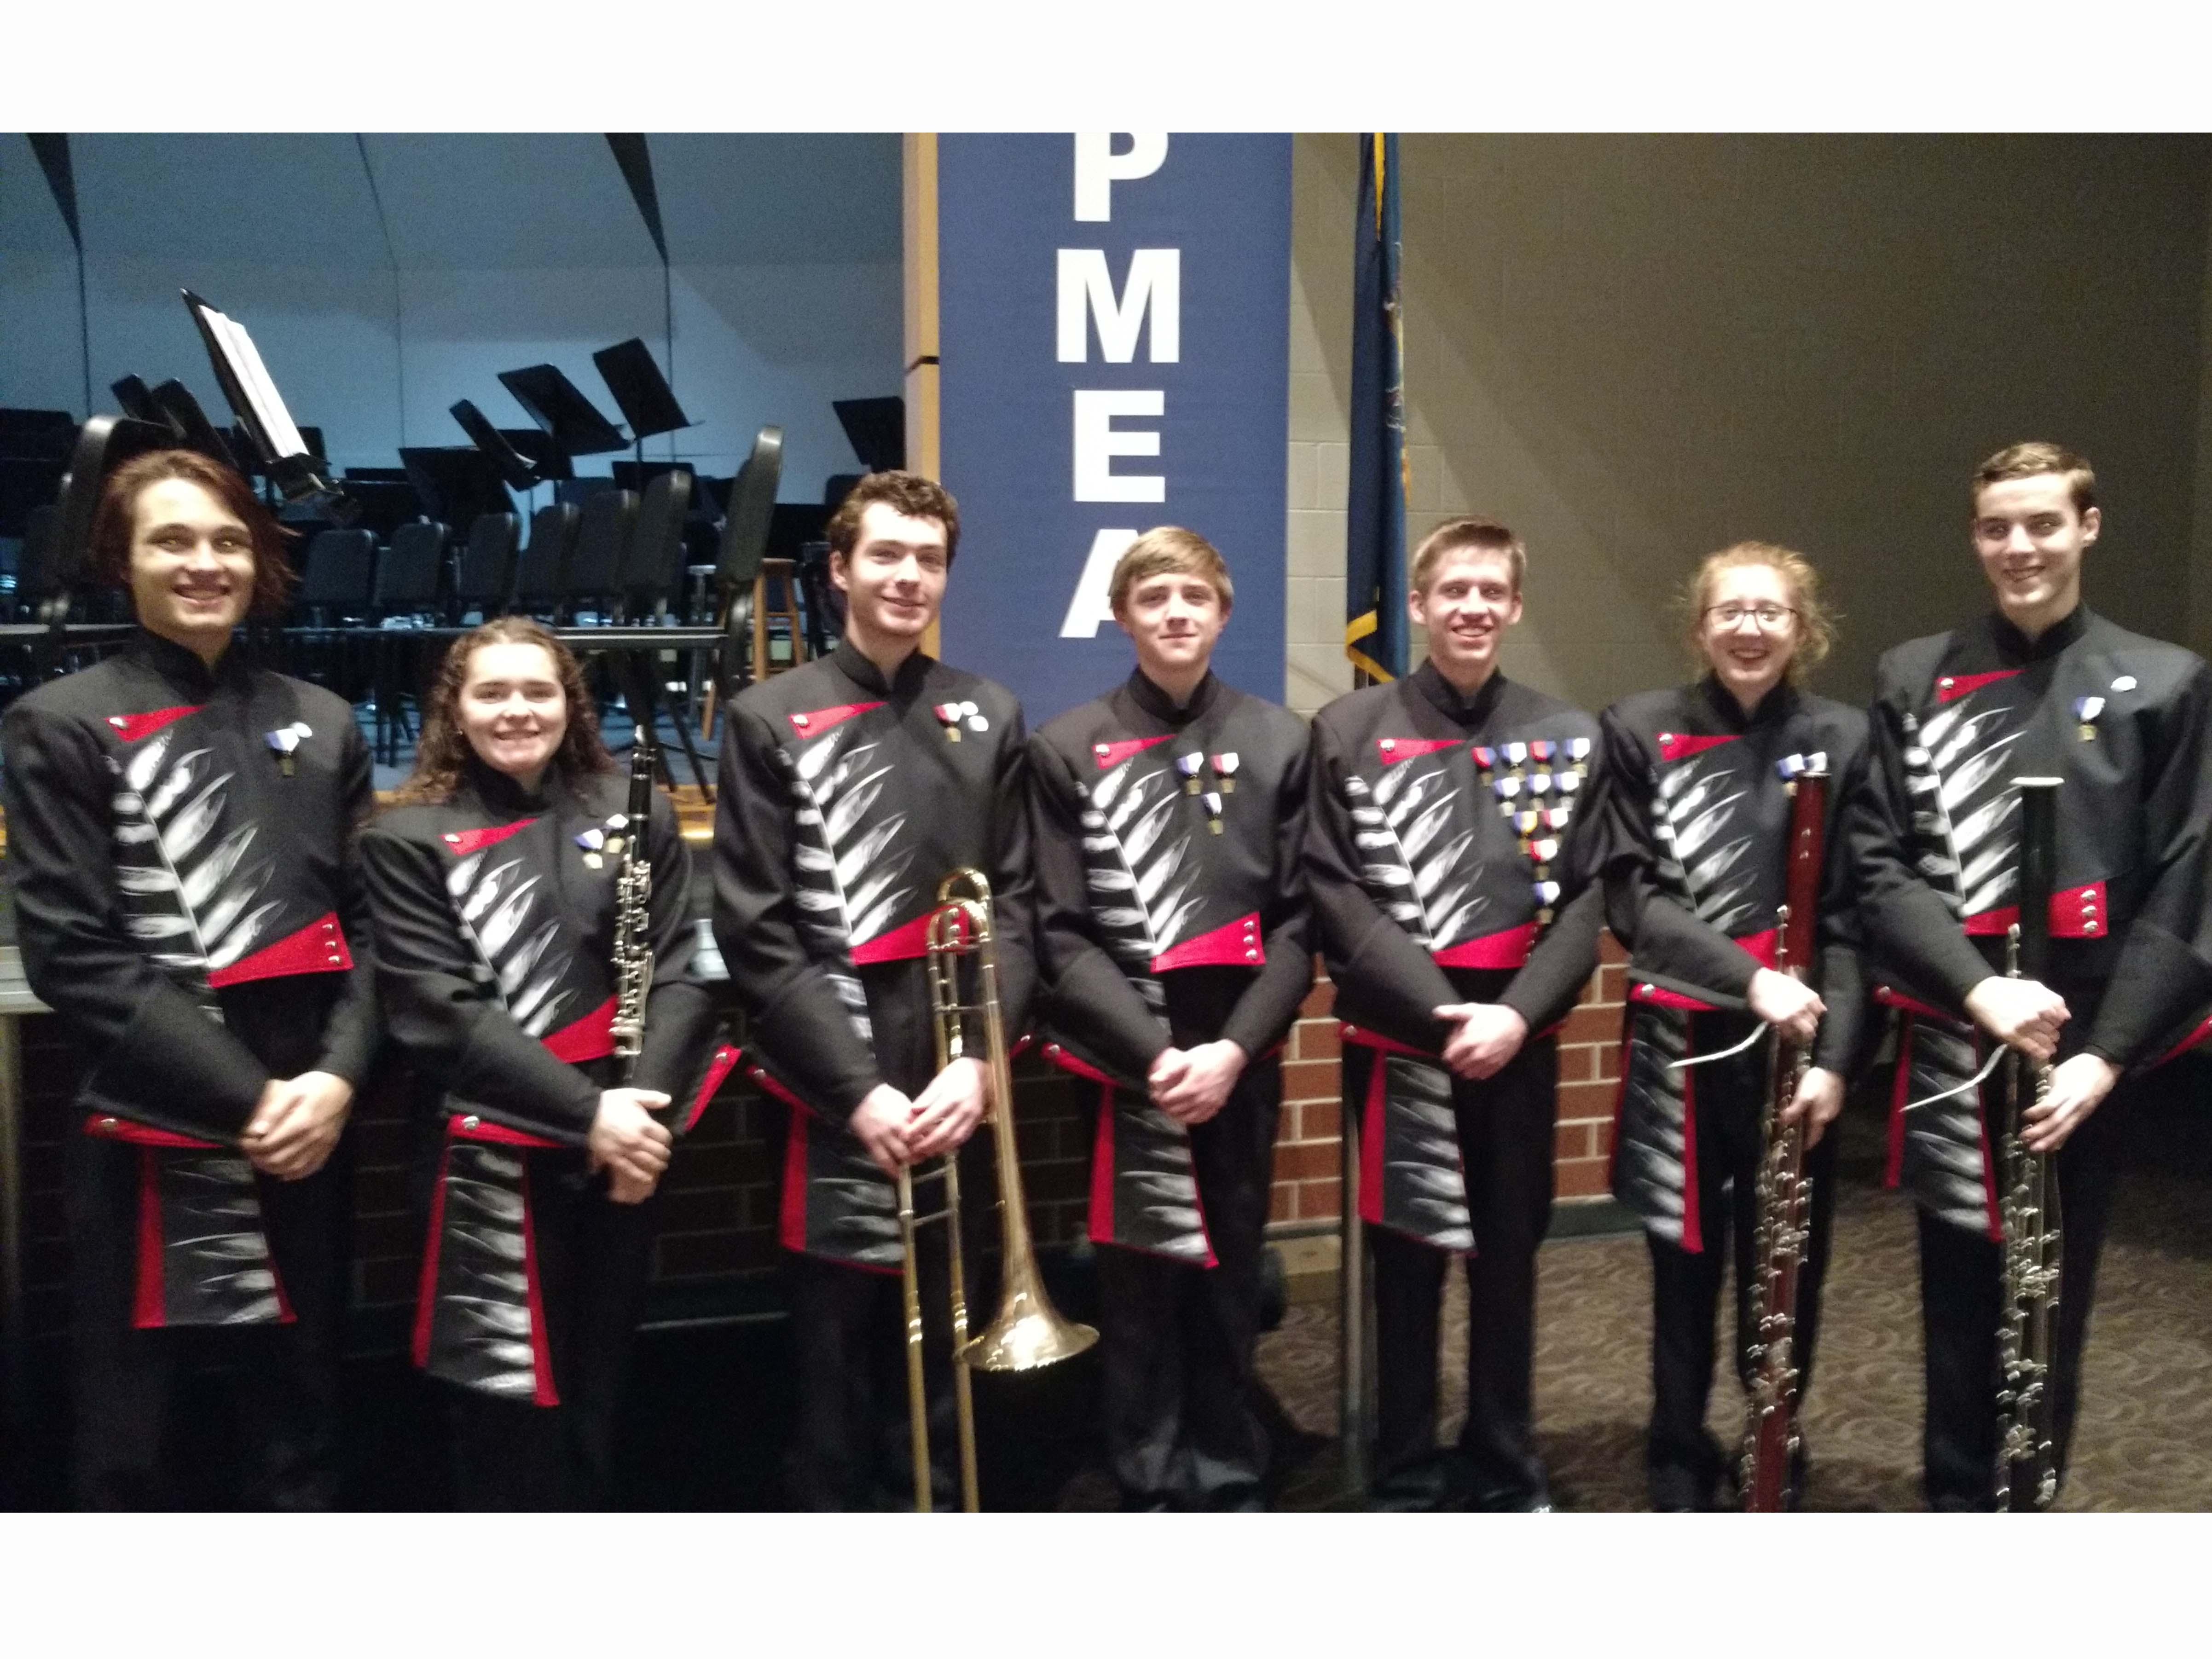 Susquehannock district band members from left:  Joe Fair, Ann Marie Falzone, Connor Skevington, Hayden McGarvey, Julien Sherman, Emma Steinauer, and Lucas Schwanke.